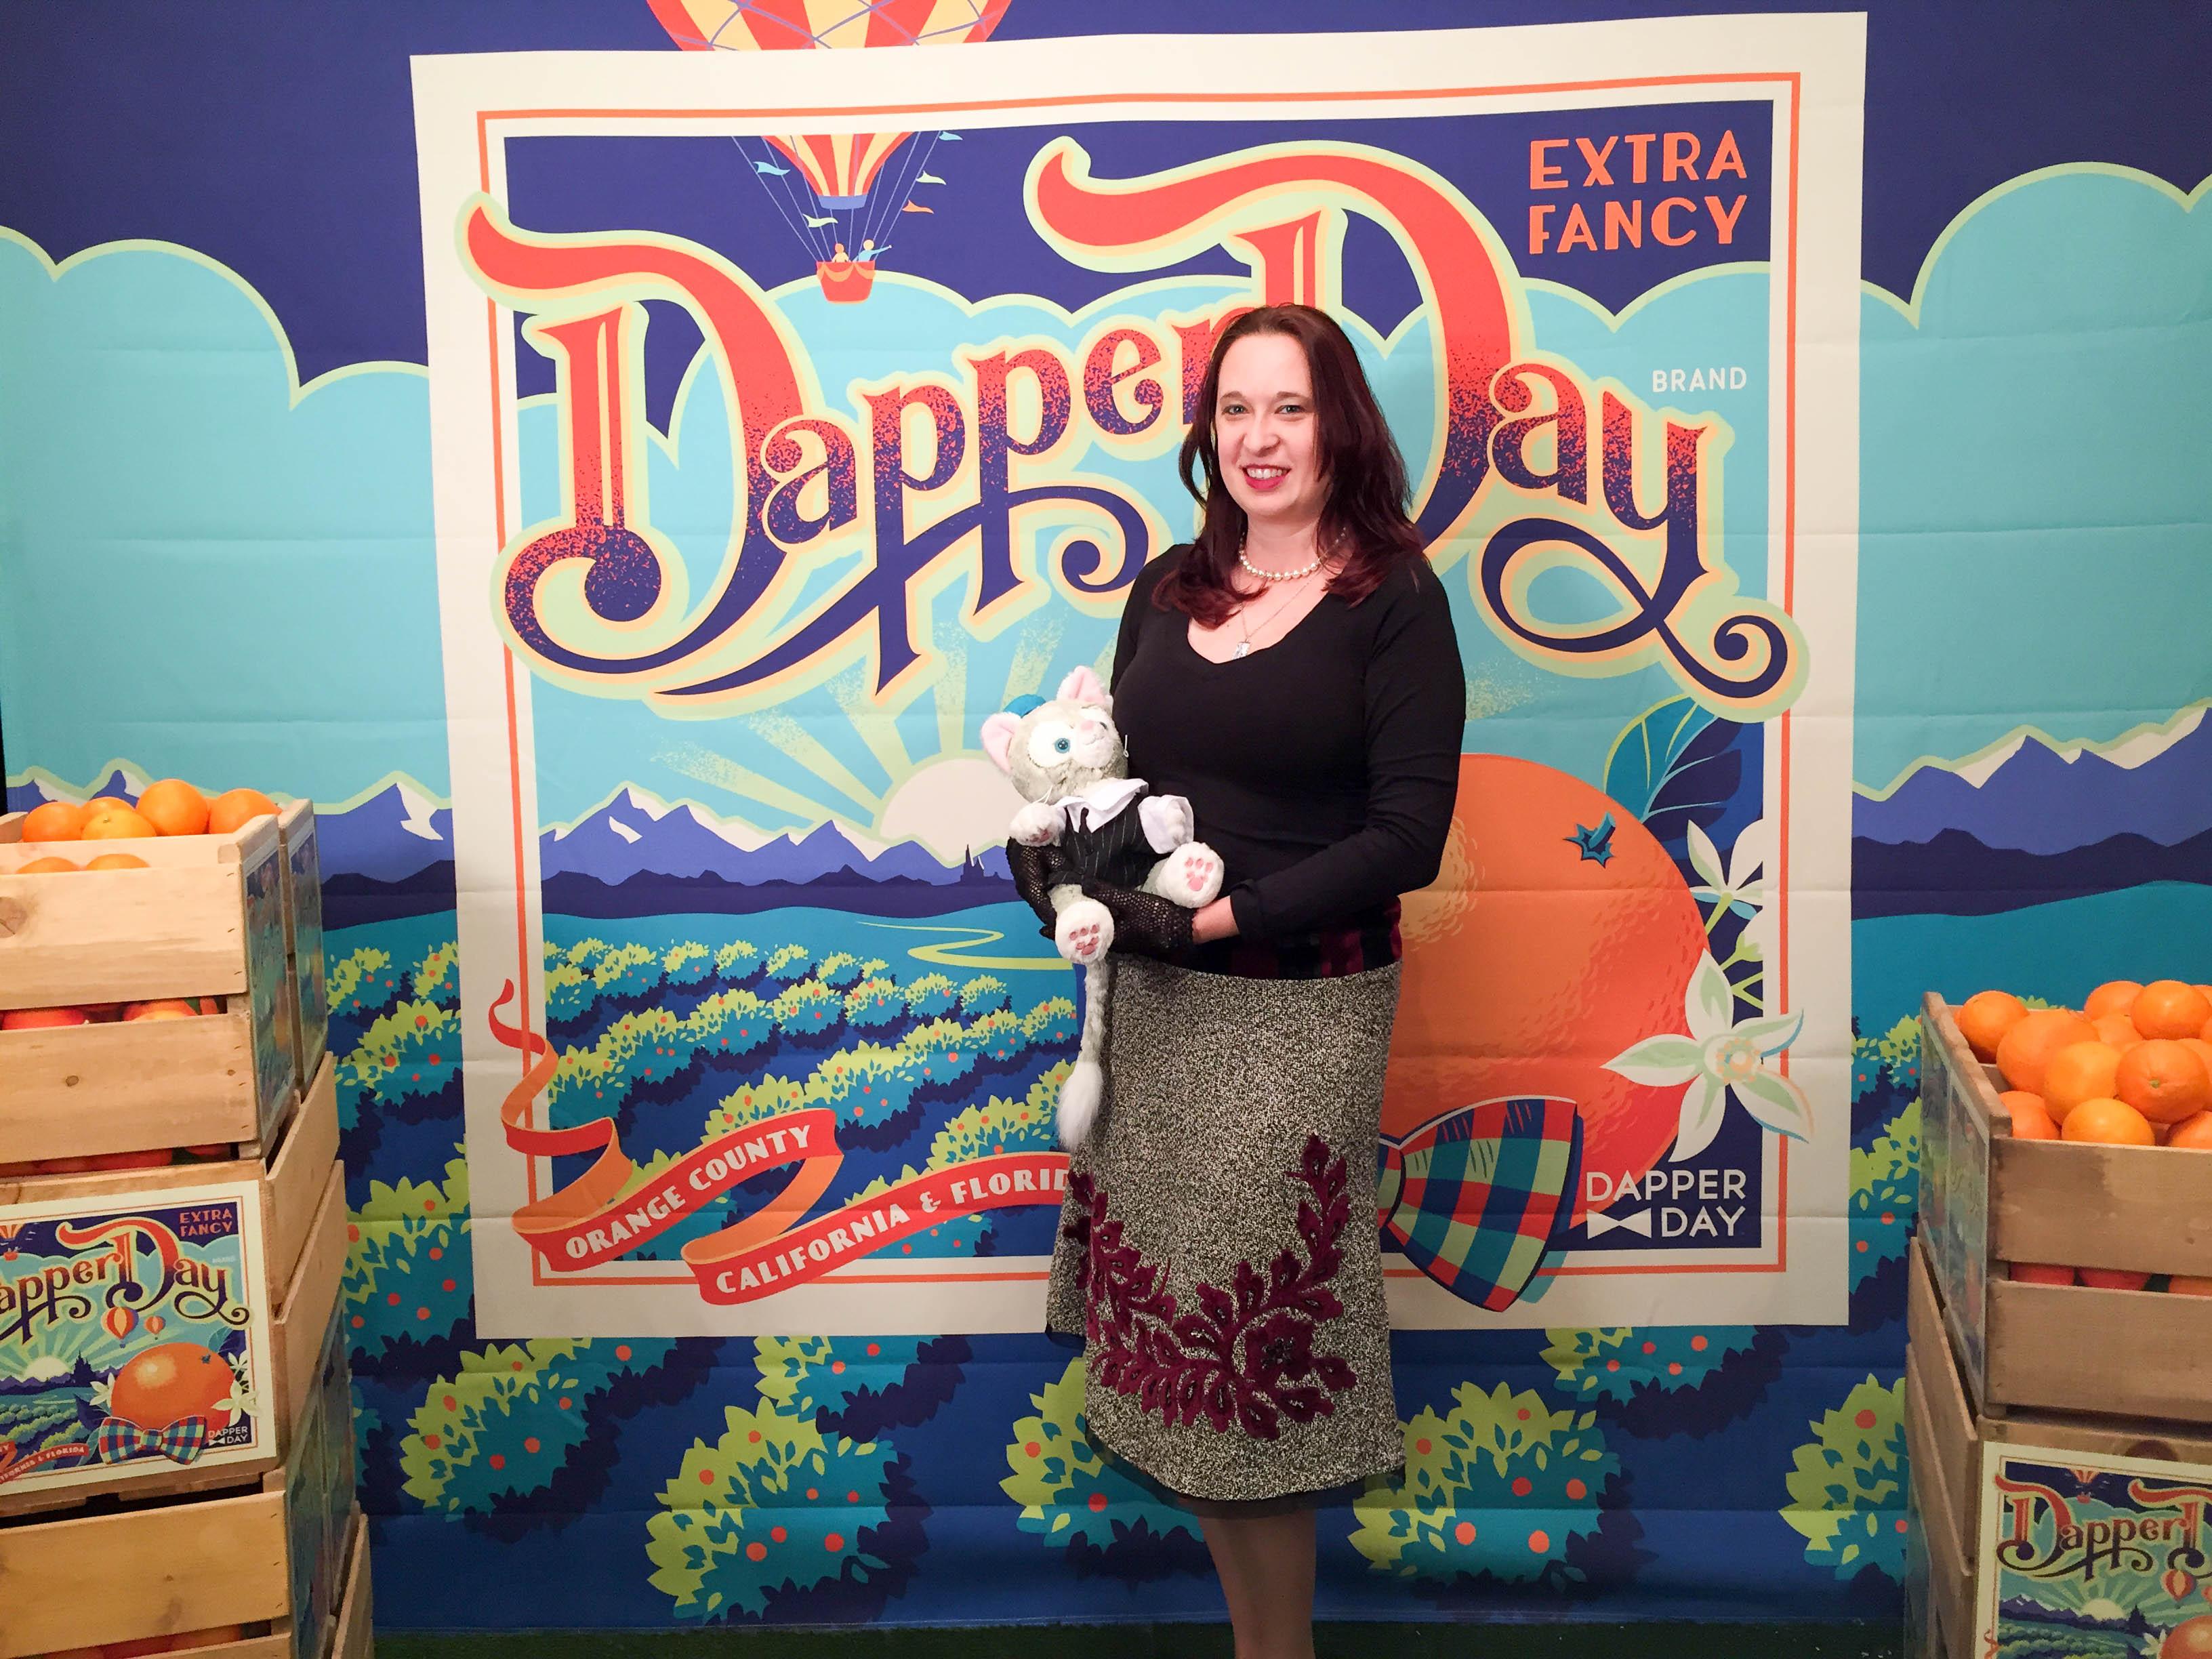 Dapper Day at Disneyland Recap - Spring 2015